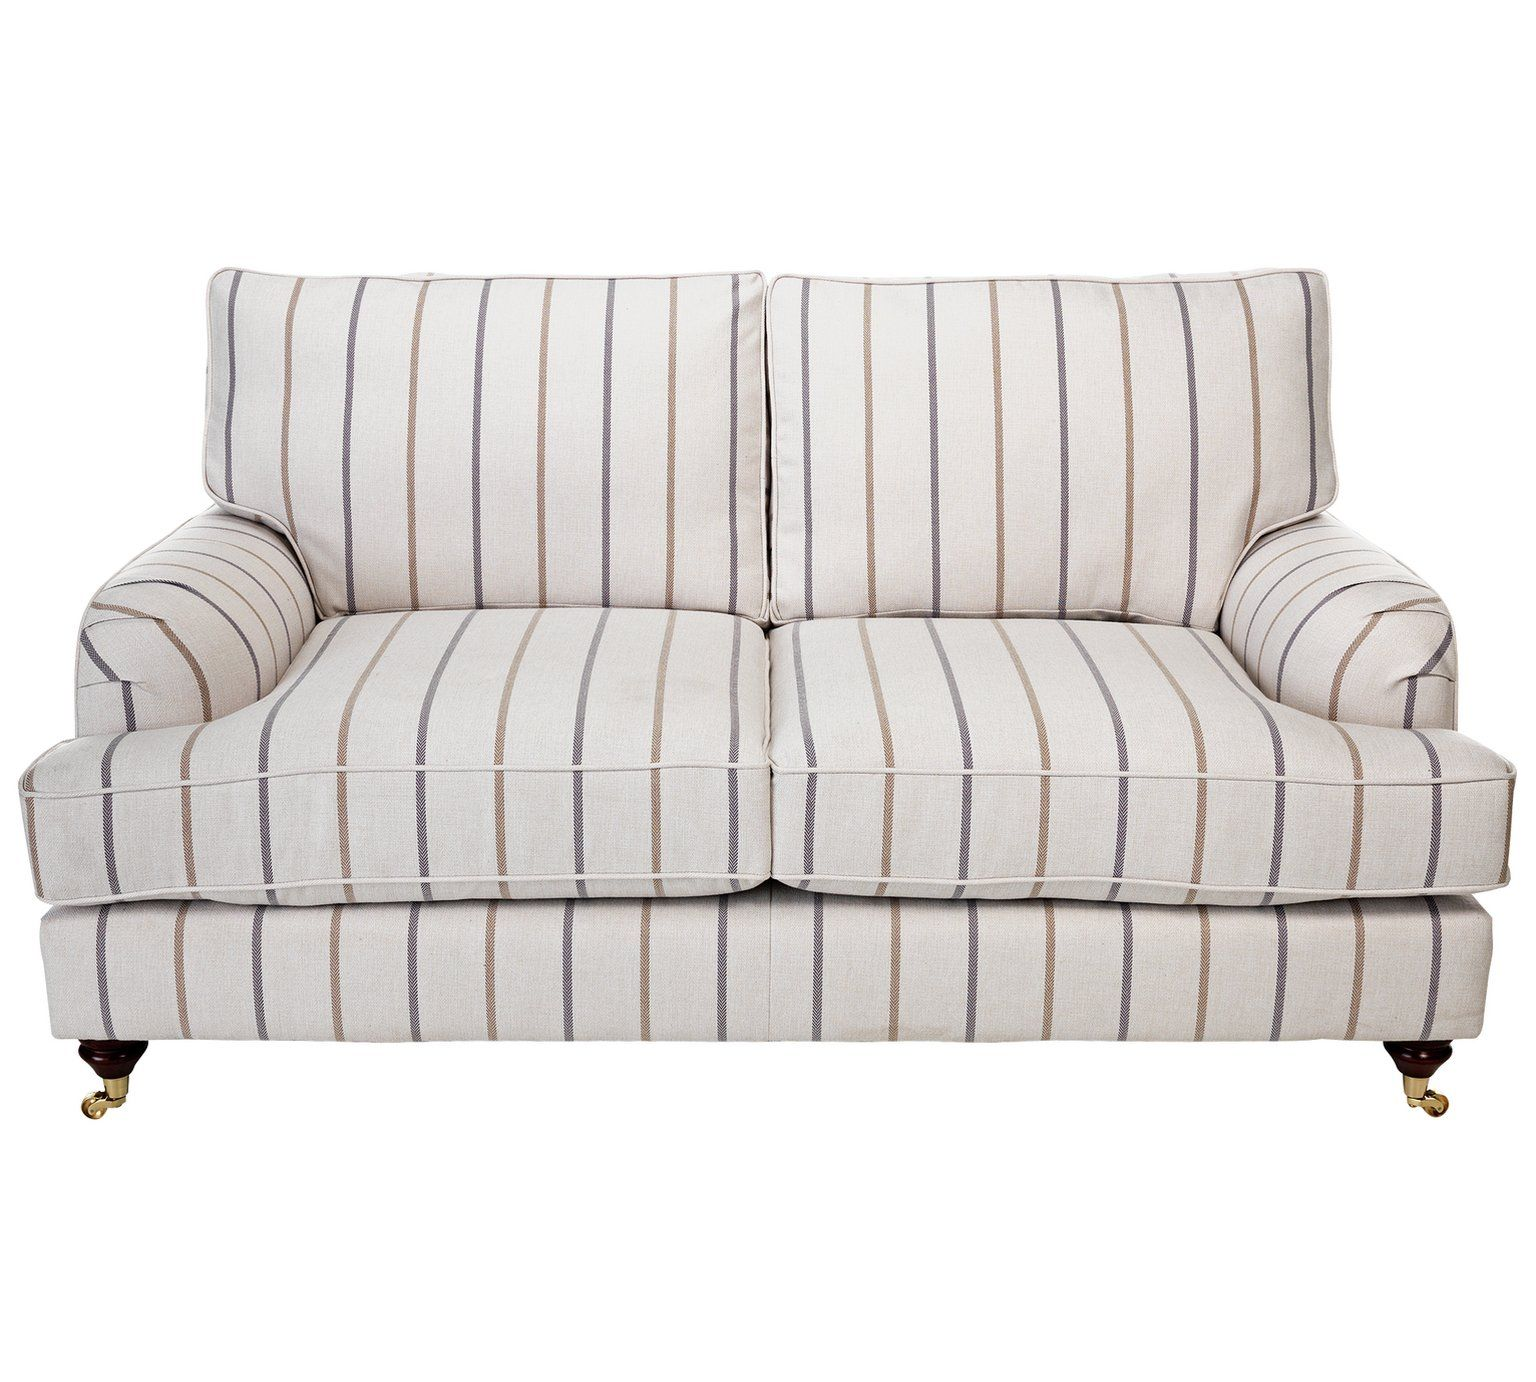 Abberton 2 Seater Fabric Sofa